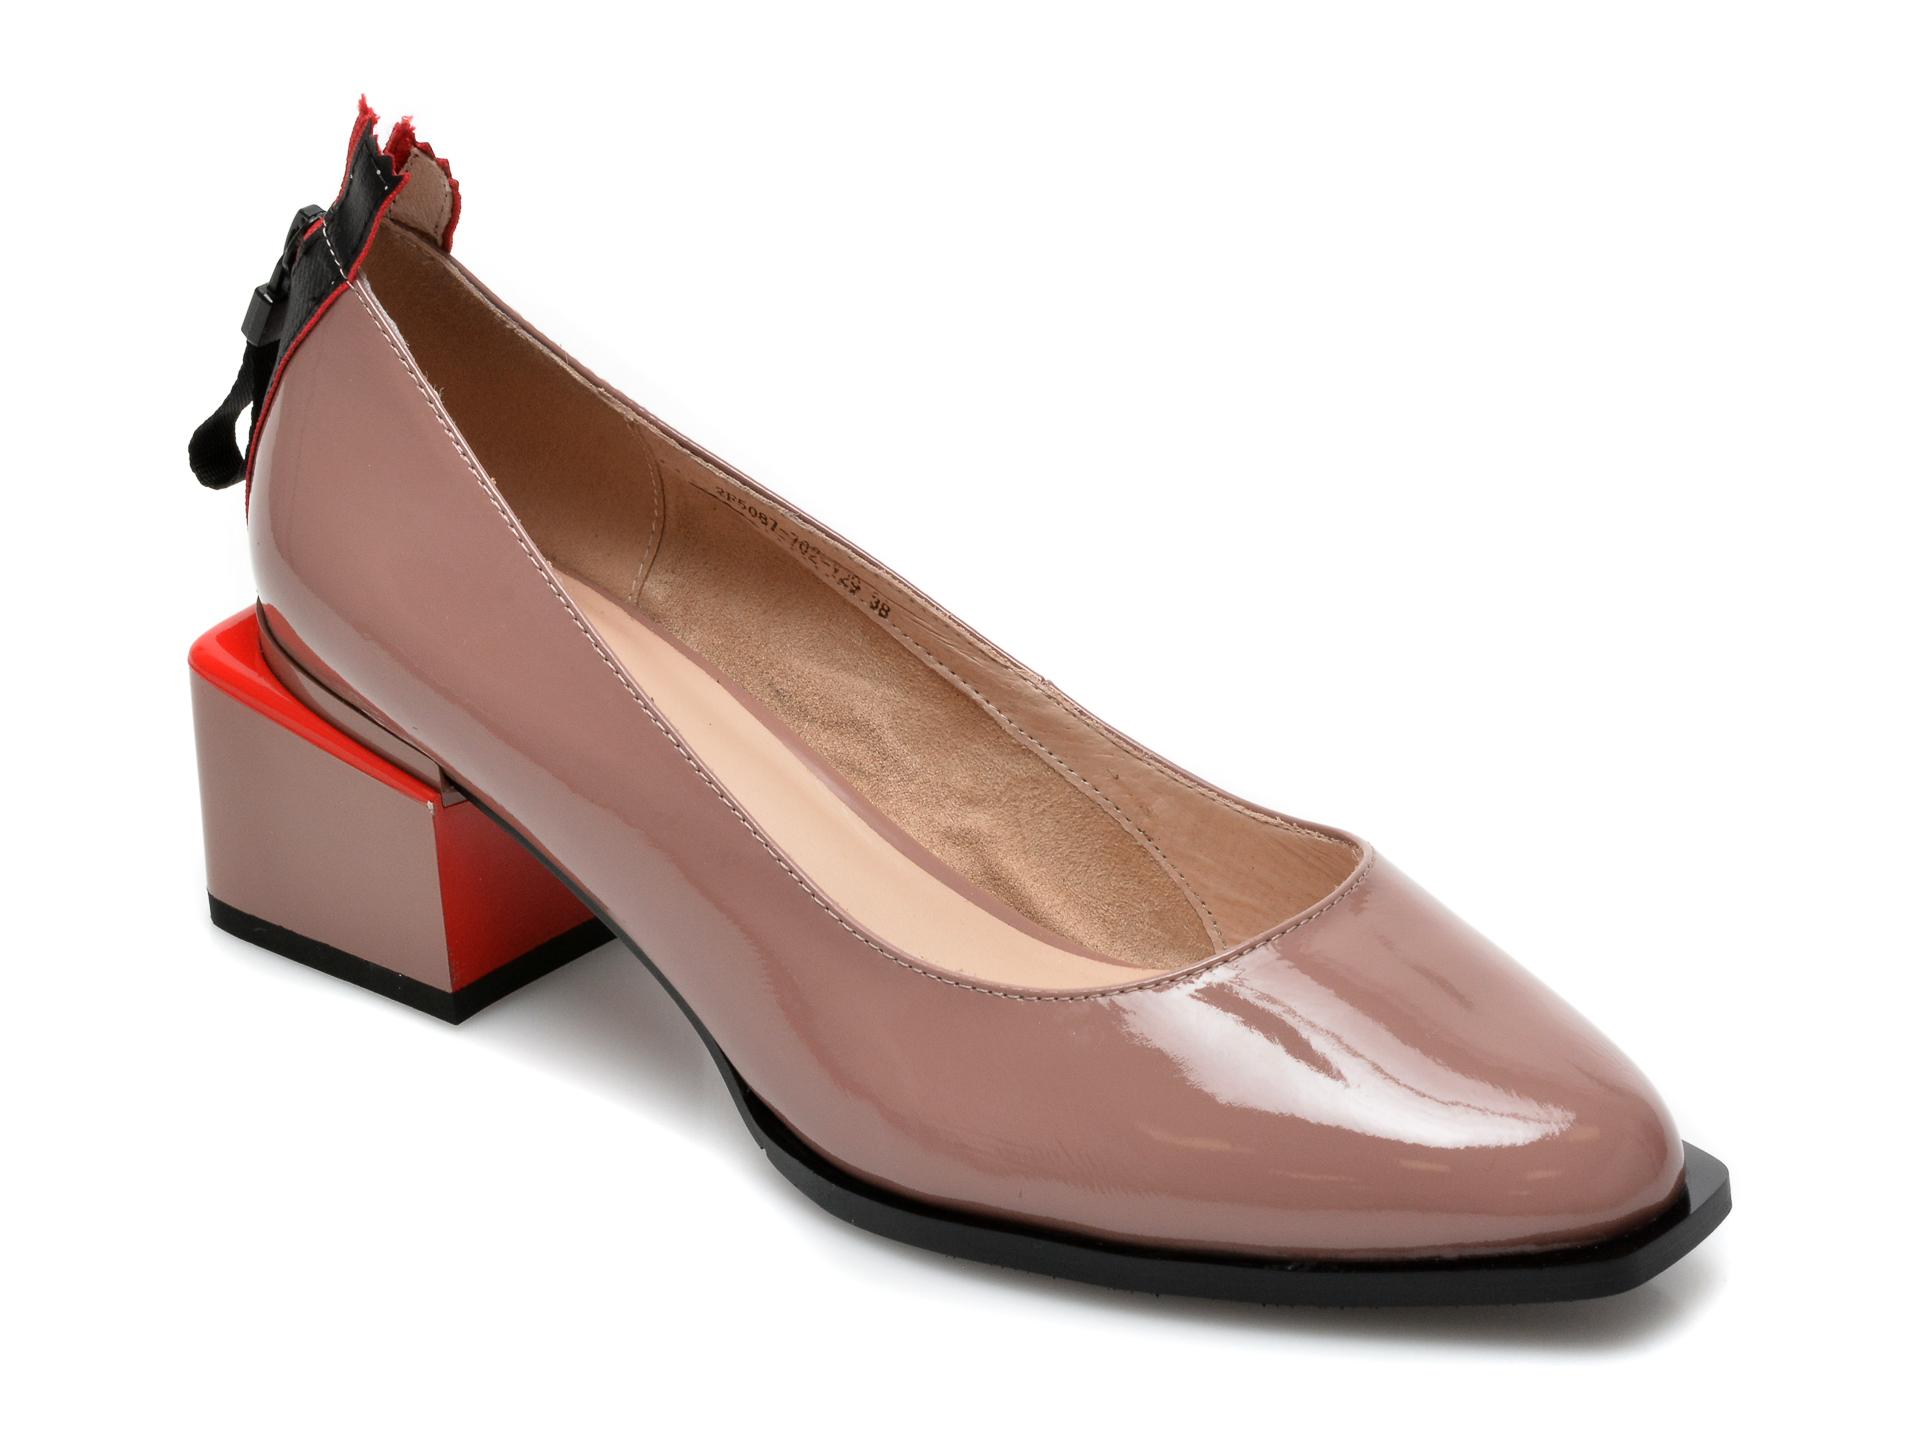 Pantofi EPICA nude, 2F50877, din piele naturala lacuita imagine otter.ro 2021